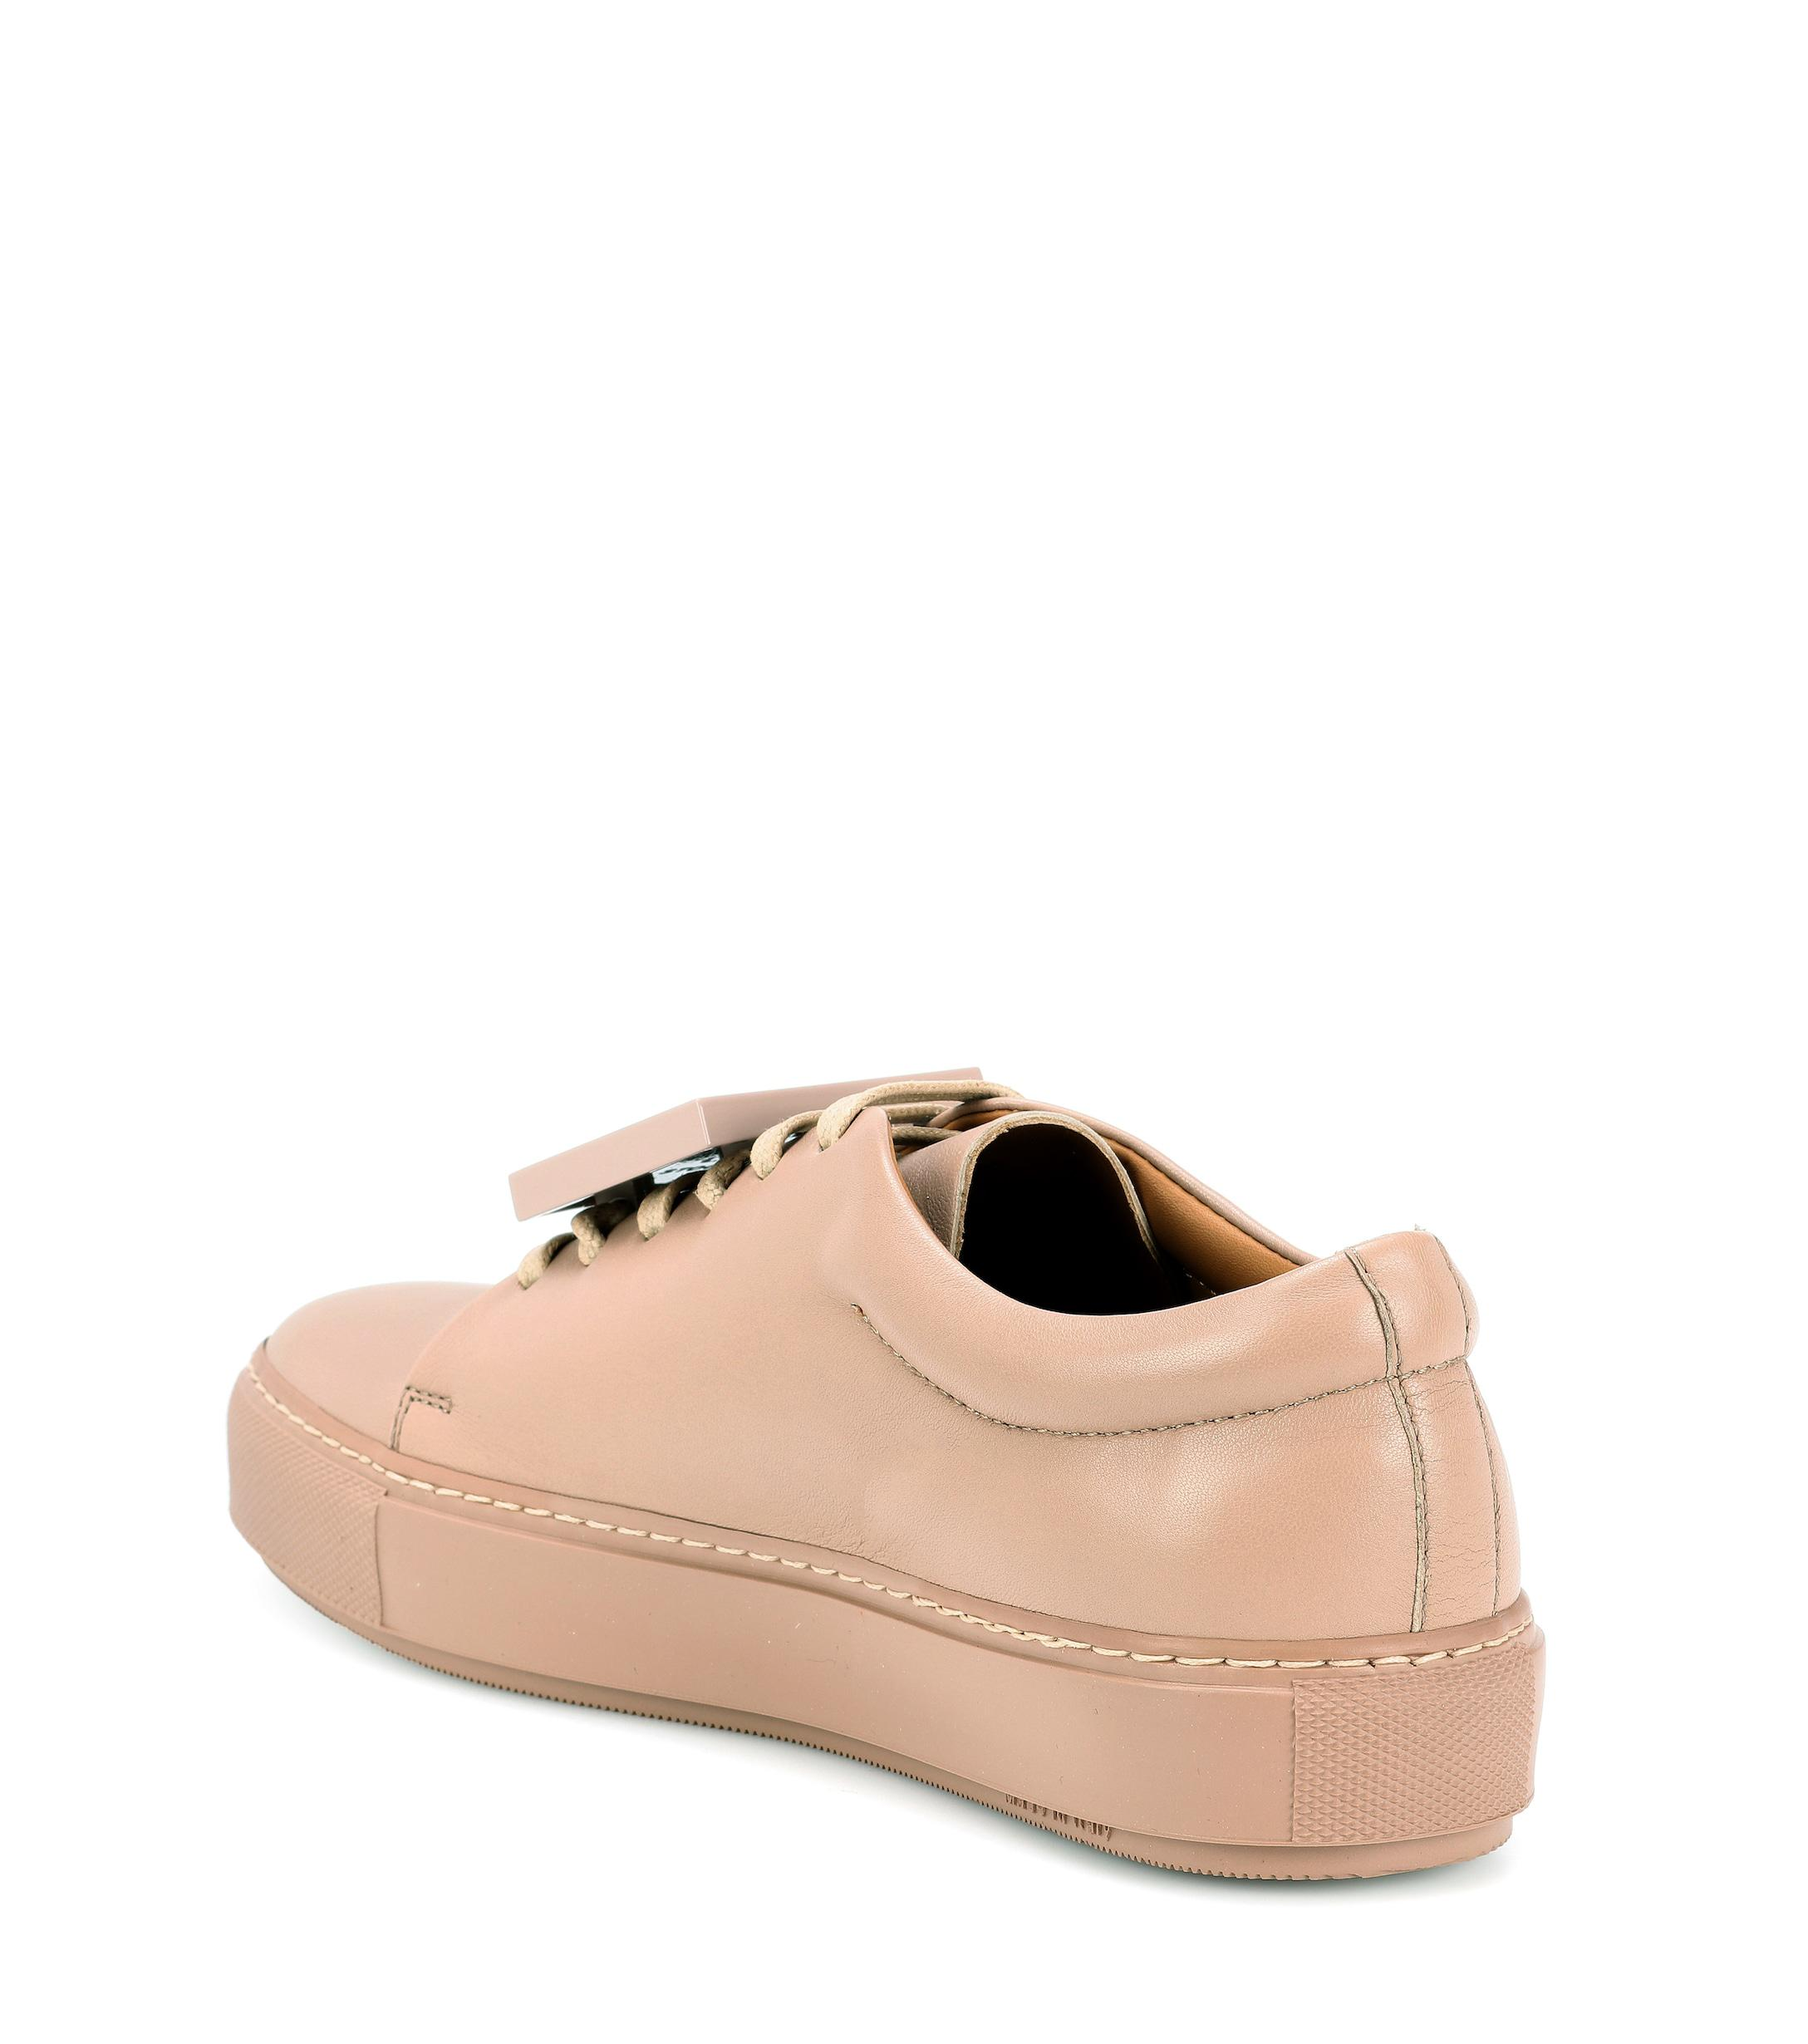 Acne Studios Adriana Turnup Leather Sneakers in Beige (Natural)